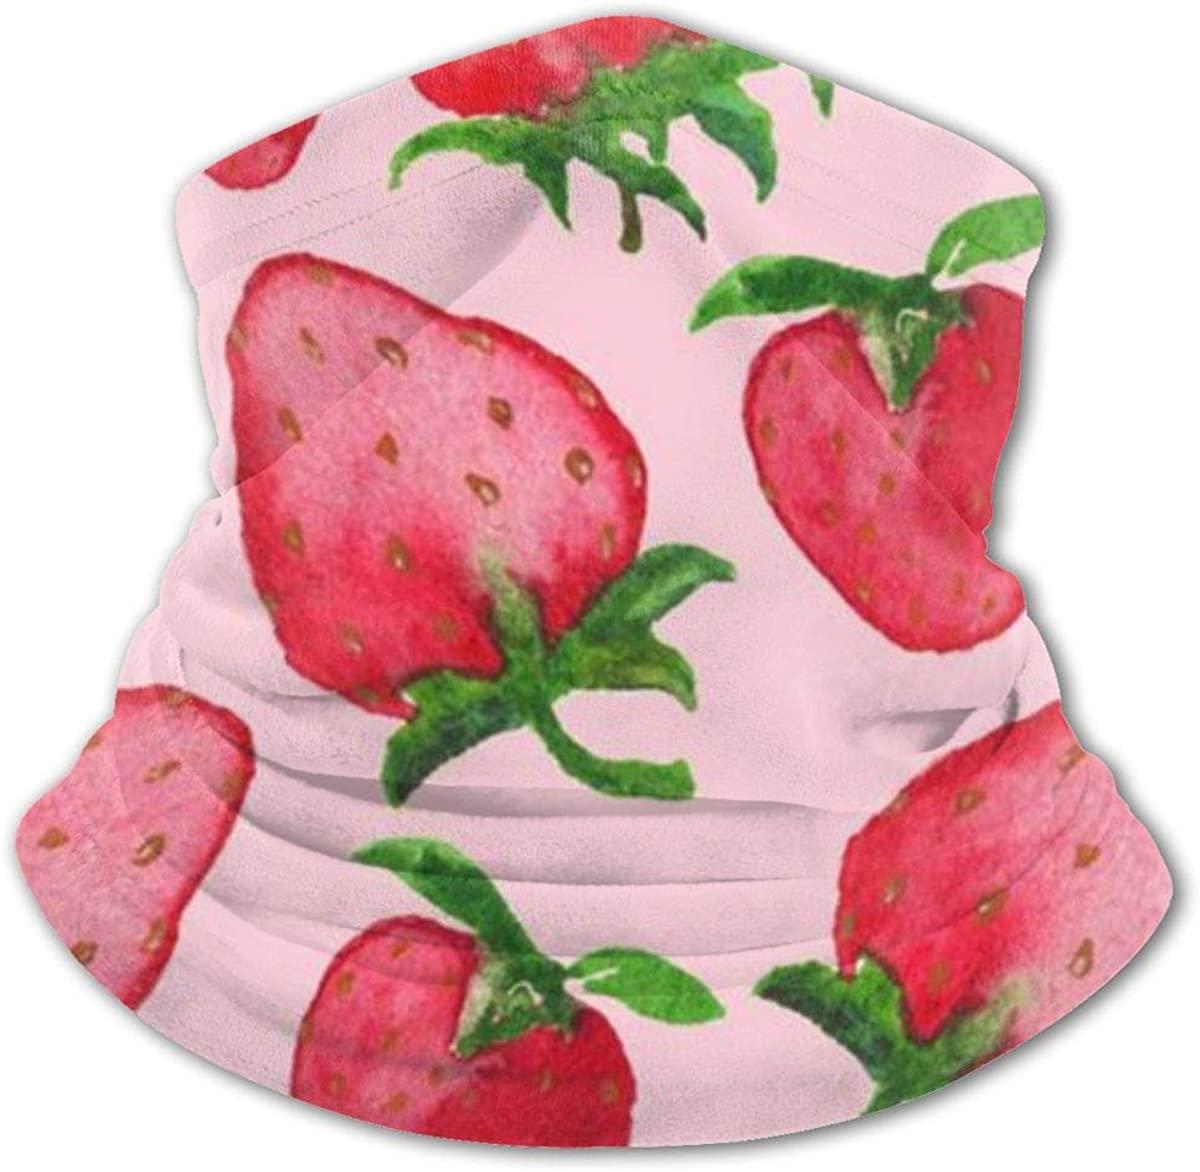 Strawberry Headwear For Girls And Boys, Head Wrap, Neck Gaiter, Headband, Tenn Fishing Mask, Magic Scarf, Tube Mask, Face Bandana Mask For Camping Running Cycling